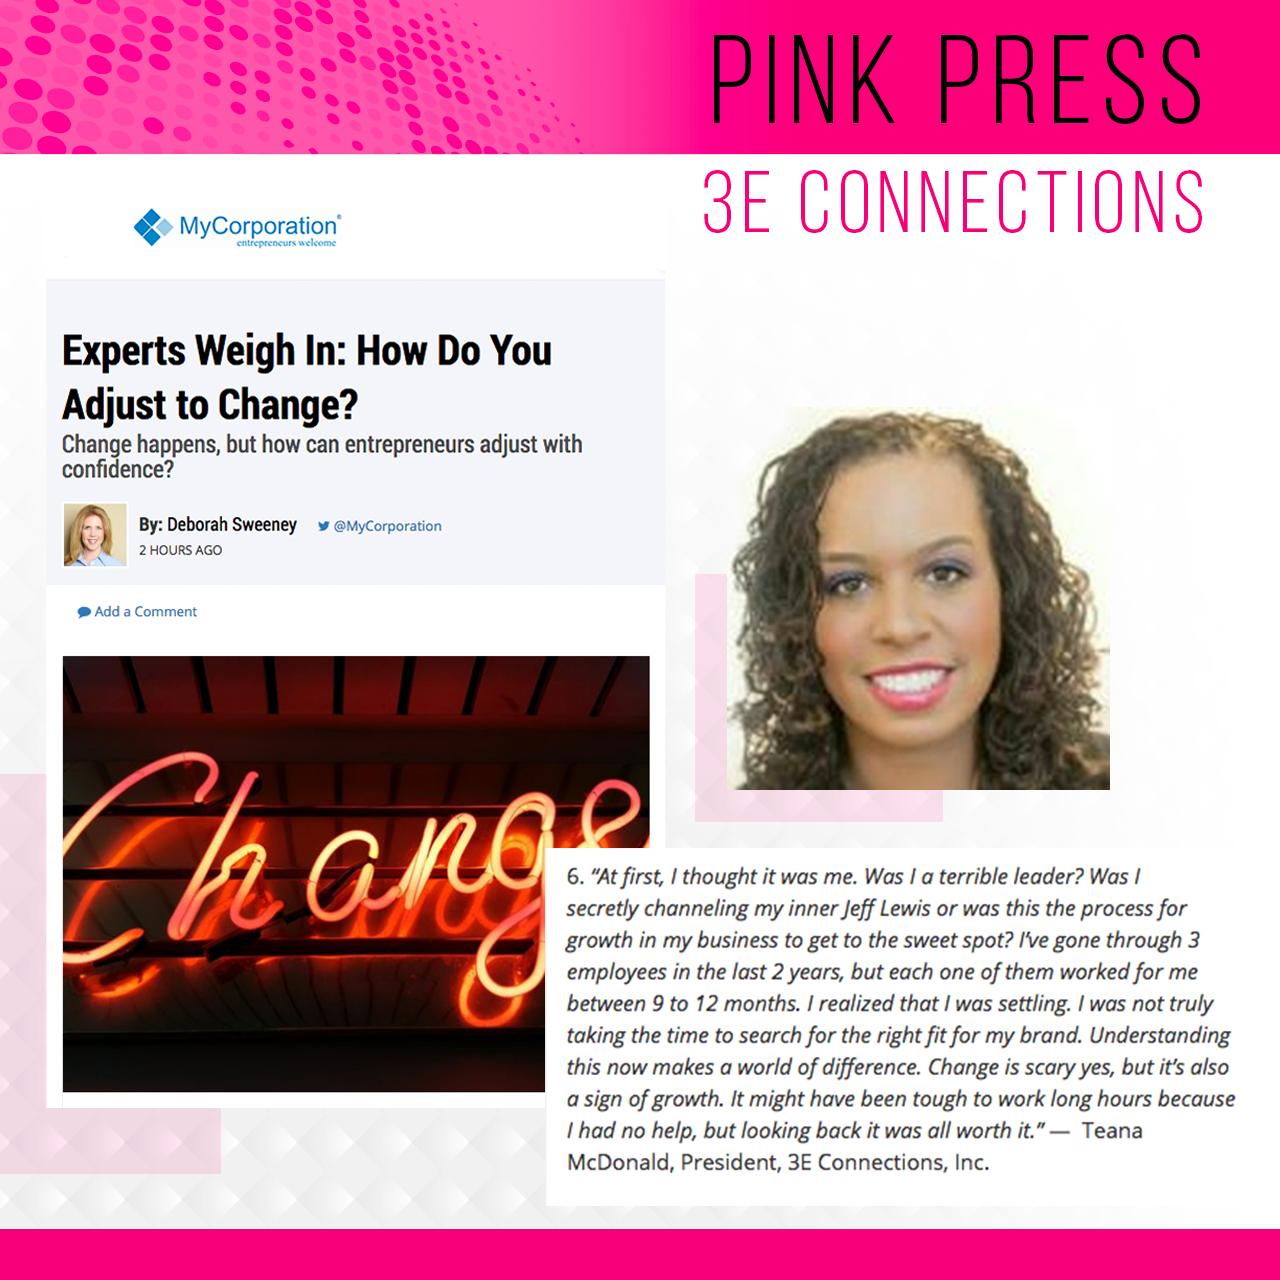 PinkPress_myCorporartion.png